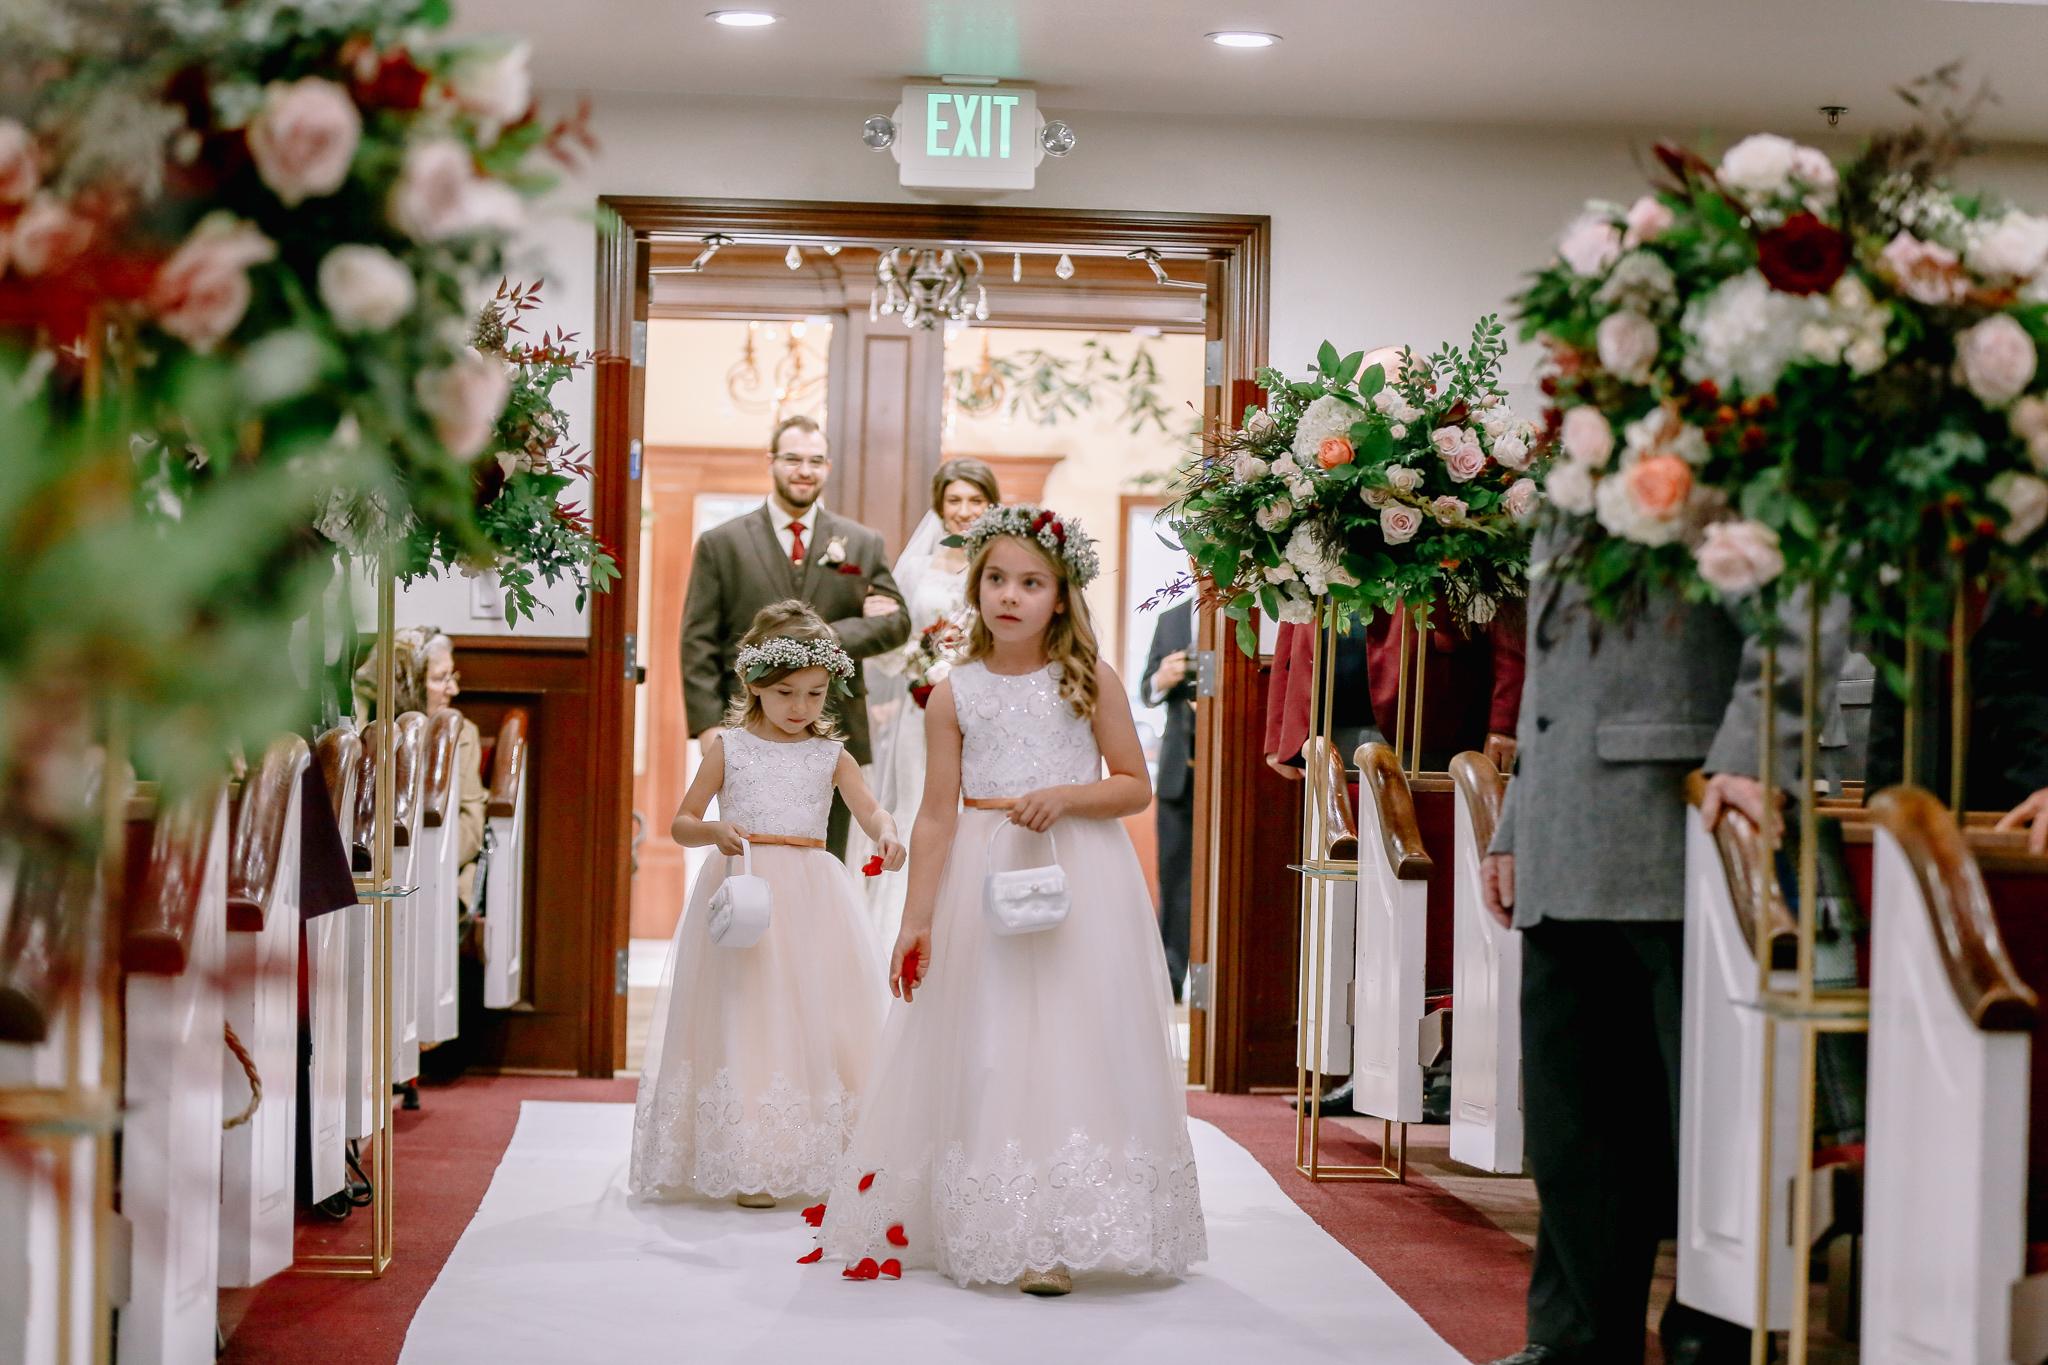 Manu and Laura - Portland Wedding Photographer - 41.jpg